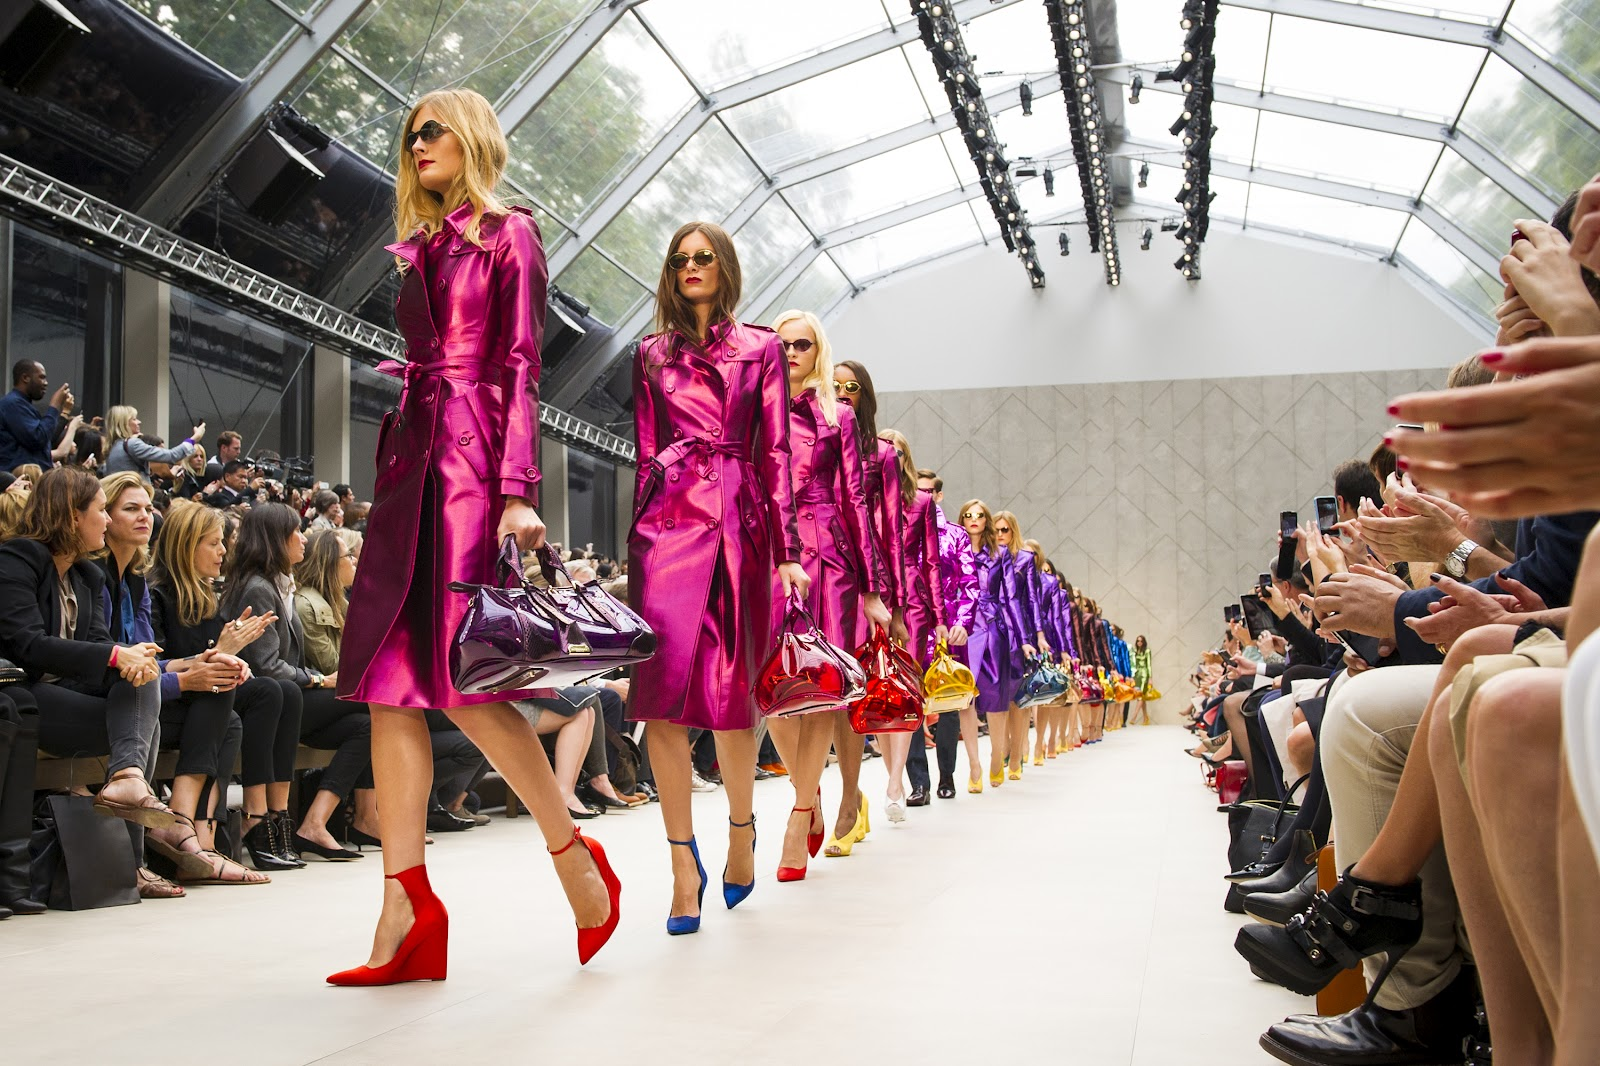 Burberry_Prorsum_Womenswear_Spring_Summer_2013_Show_-_Finale